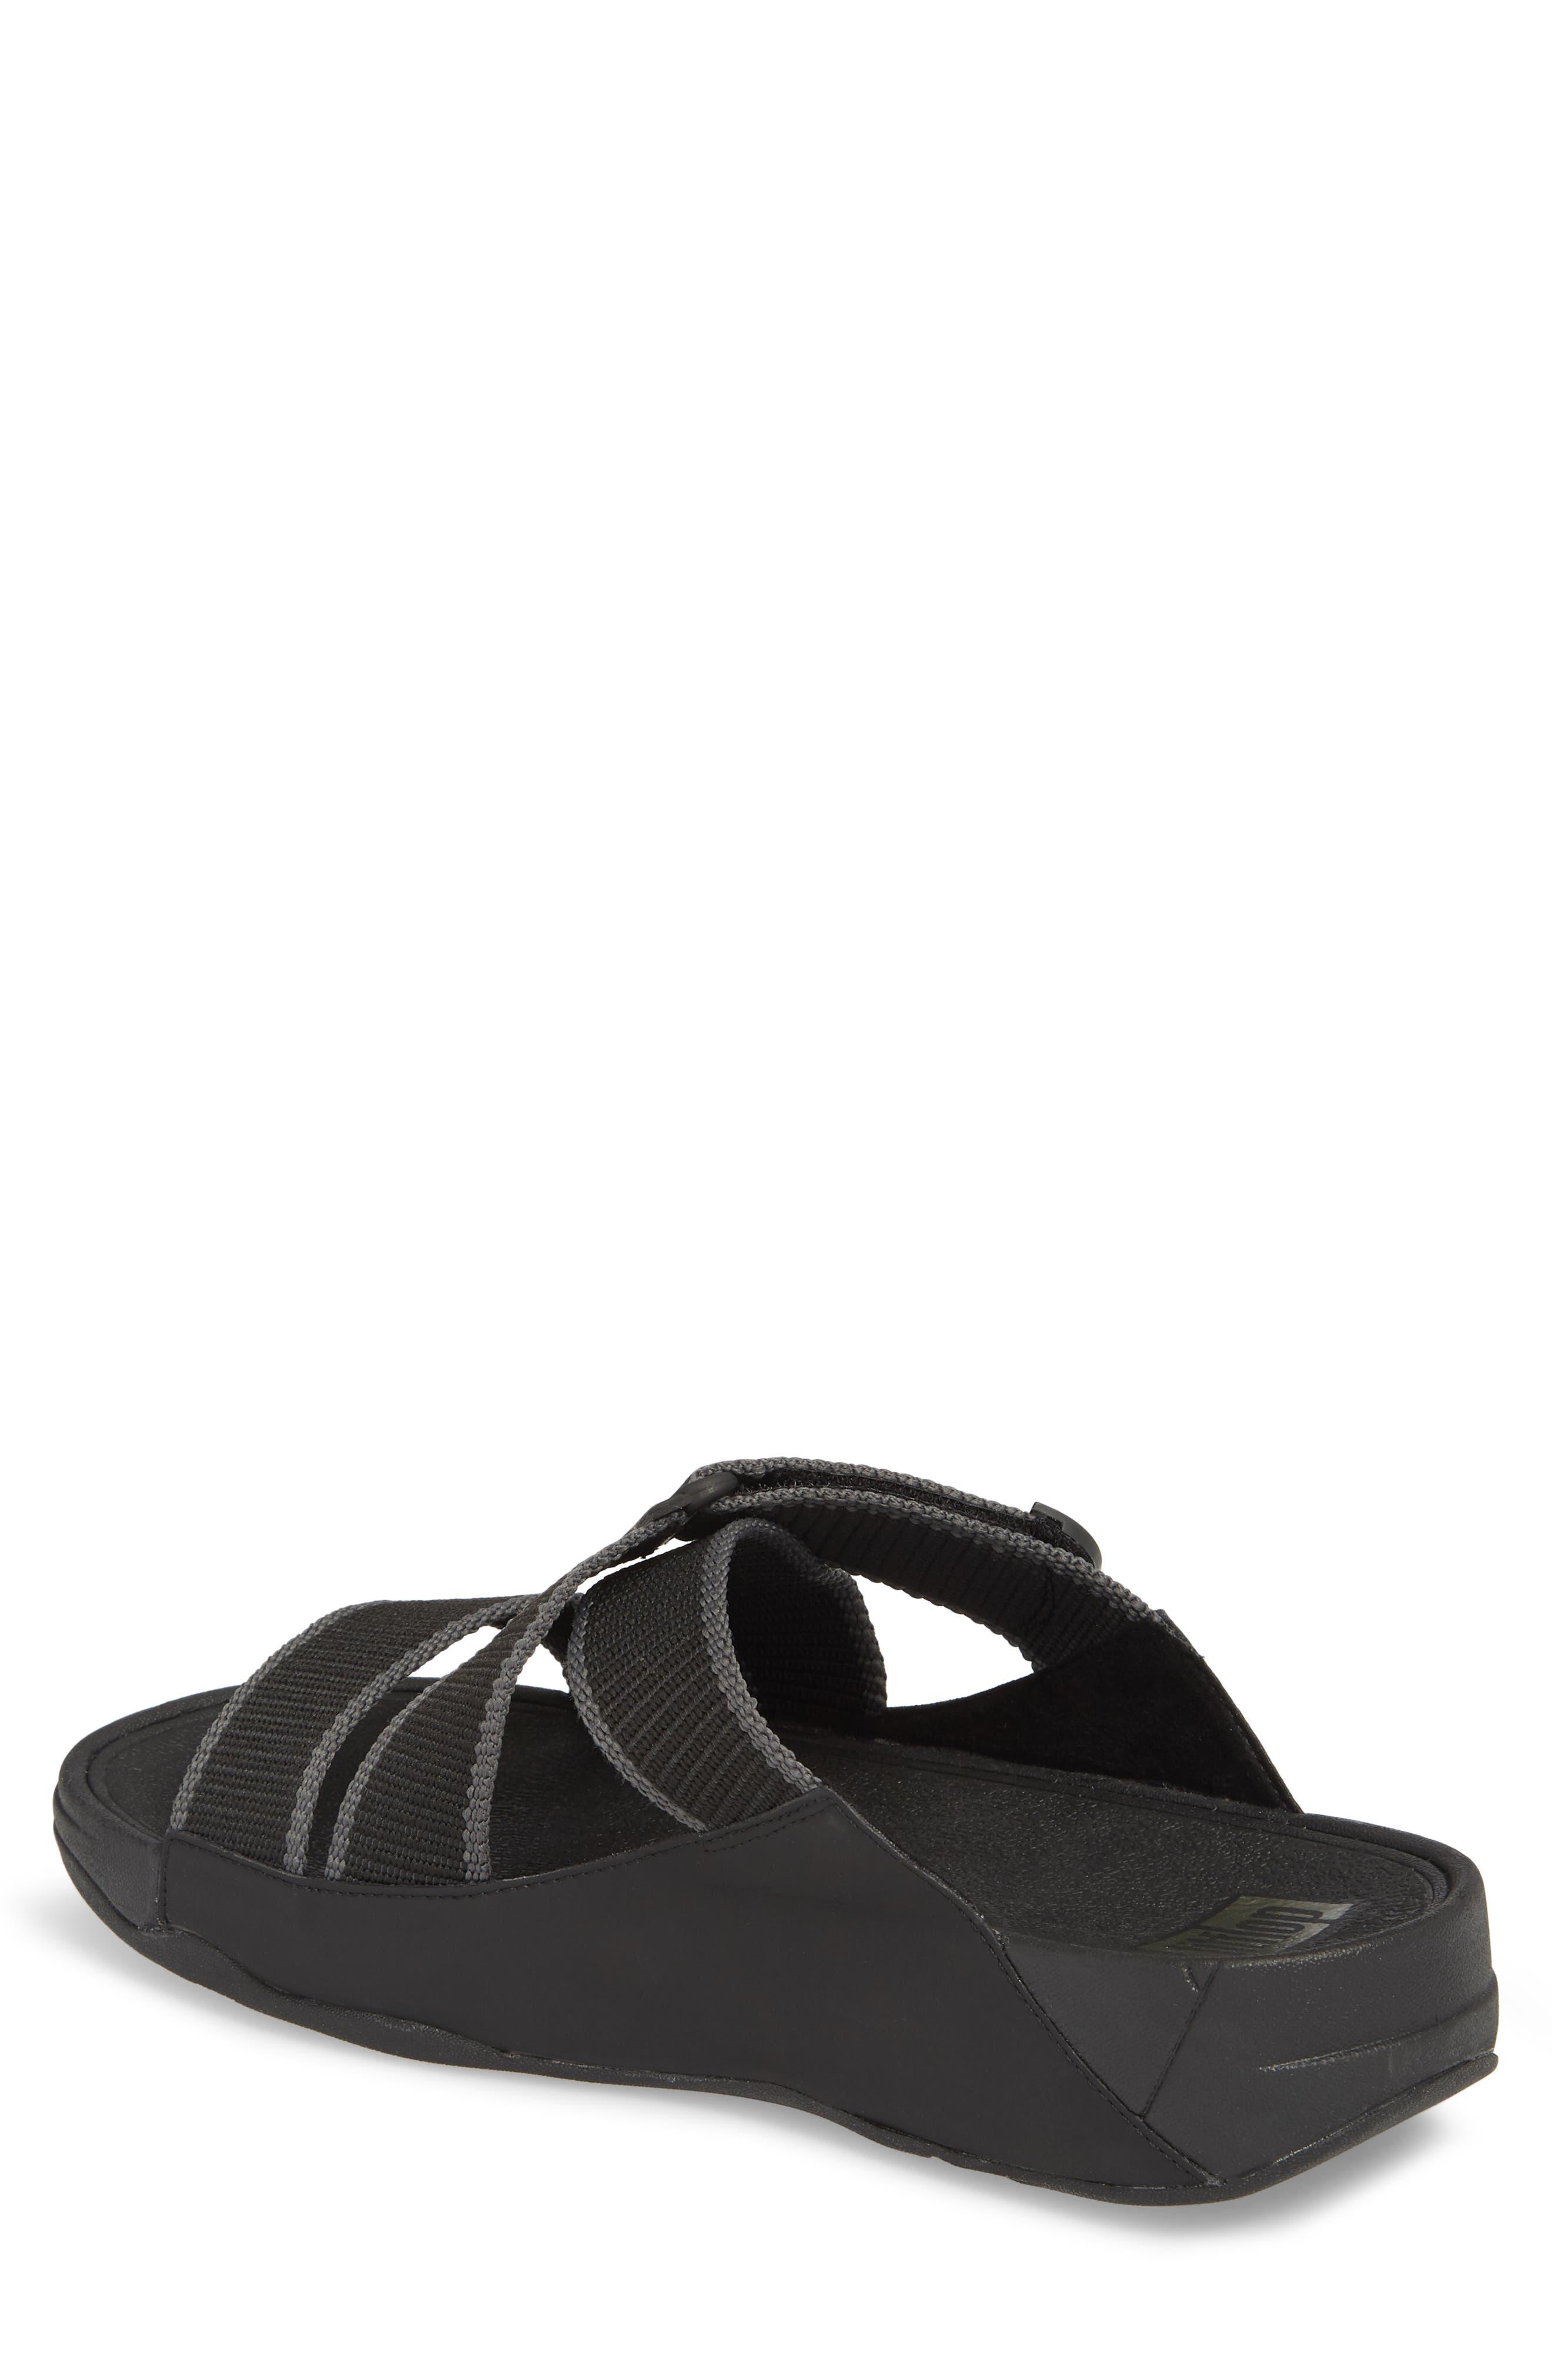 Sling II Slide Sandal,                             Alternate thumbnail 2, color,                             BLACK/ DARK SHADOW